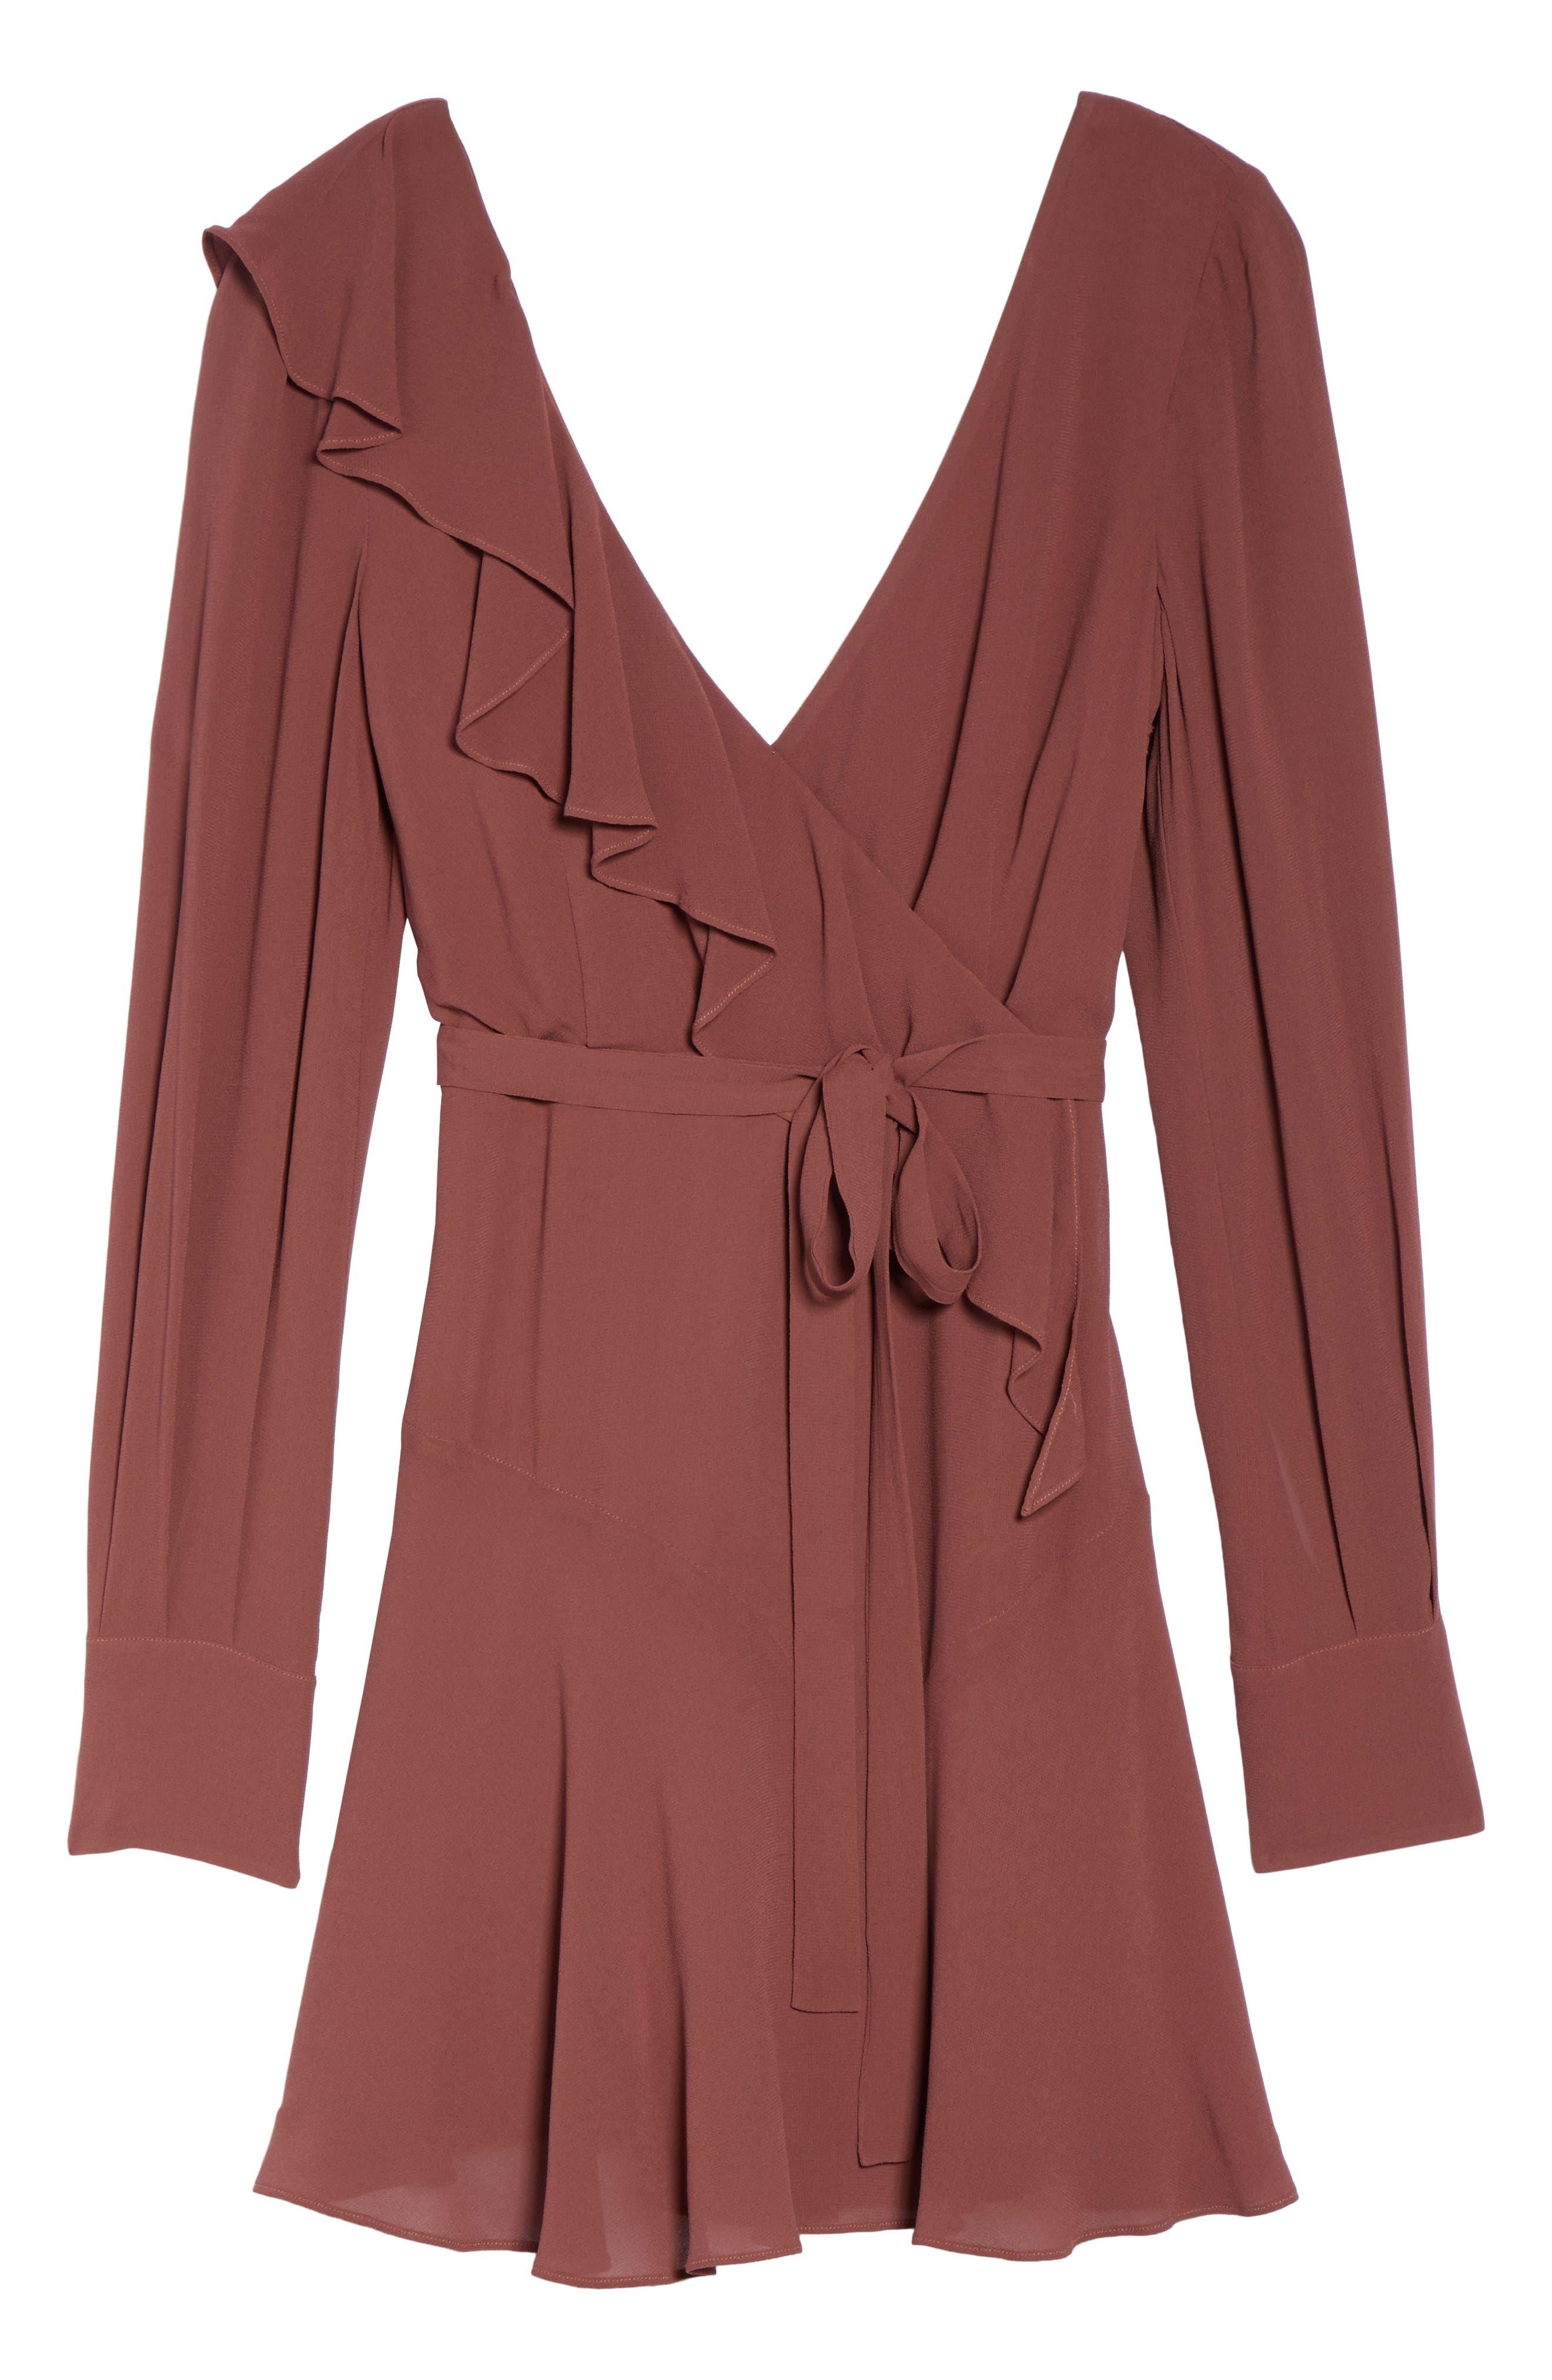 Rosie Ruffle Dress,                             Alternate thumbnail 6, color,                             Clay